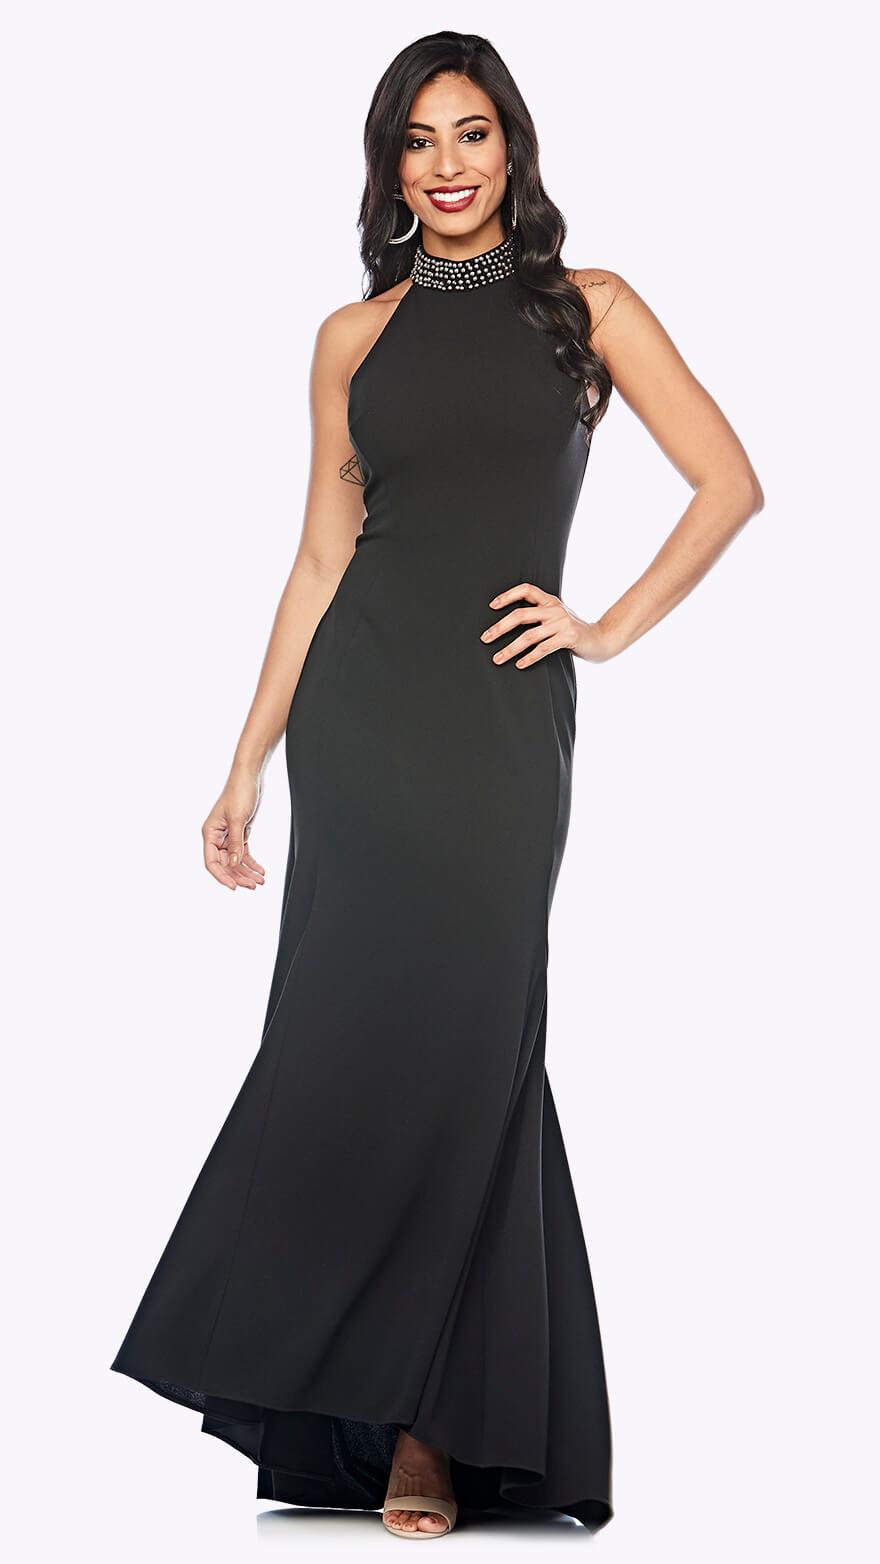 Z0207 Full-length halter neck gown with fishtail skirt and studded detail on neckline